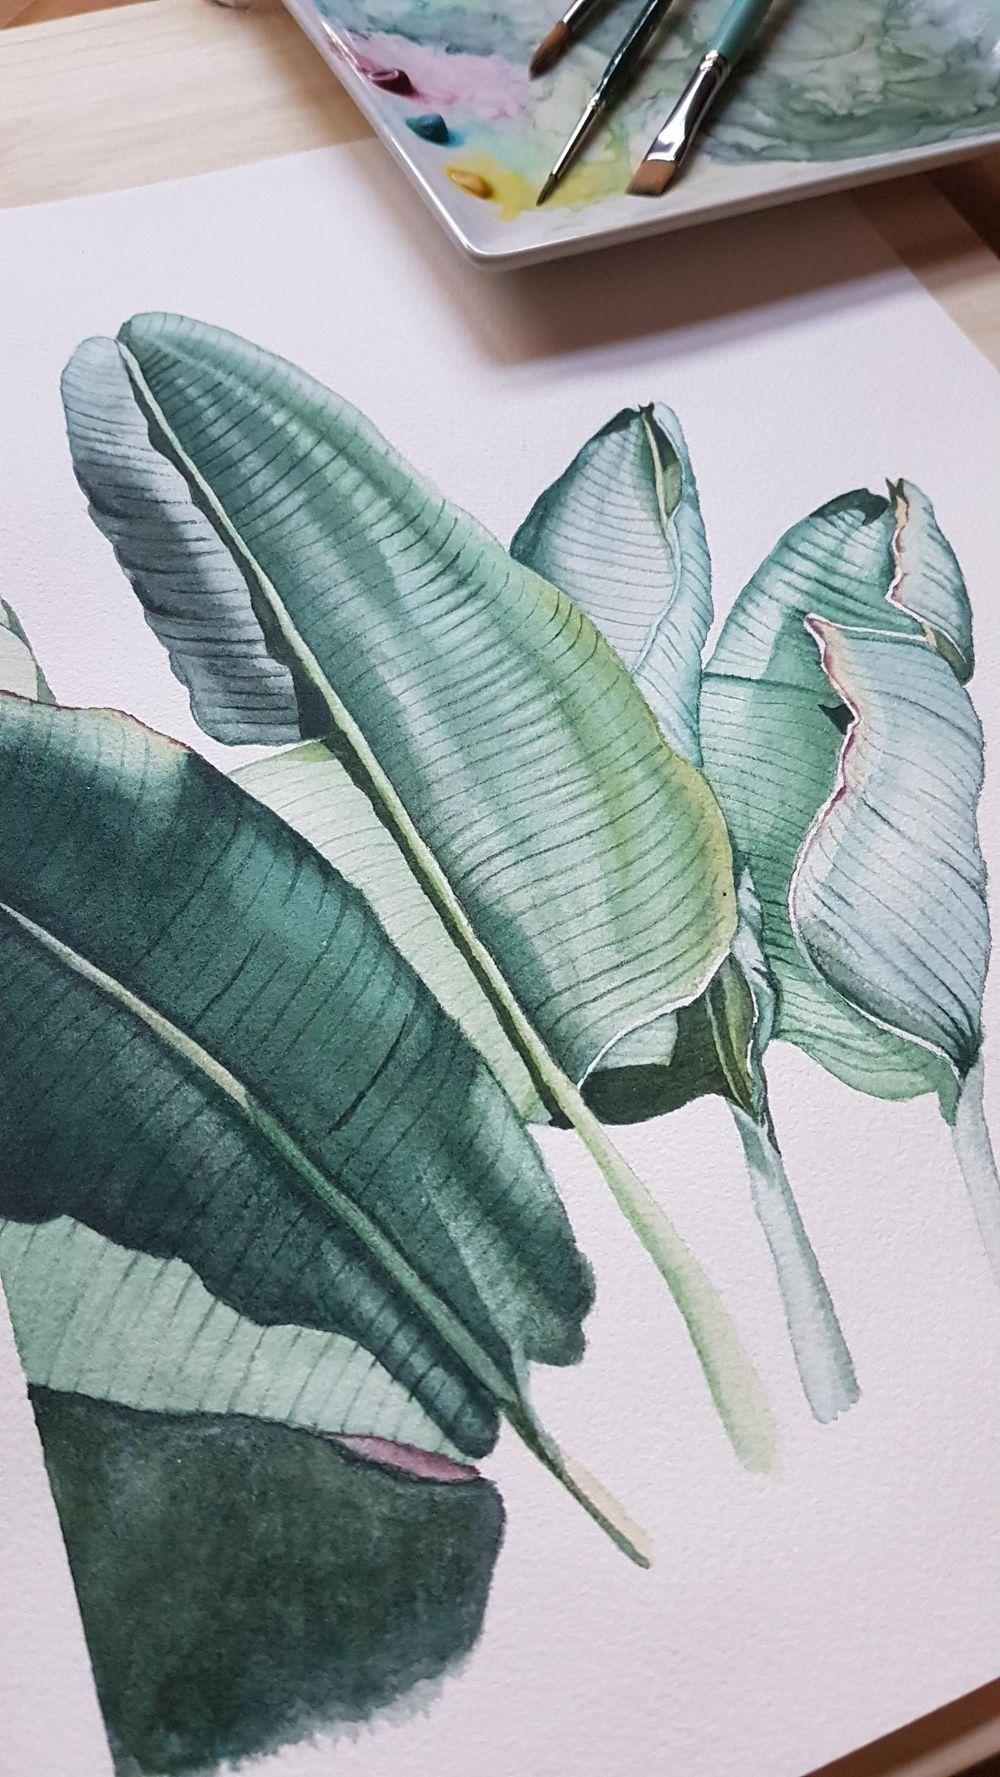 Botanical sunlight - image 1 - student project